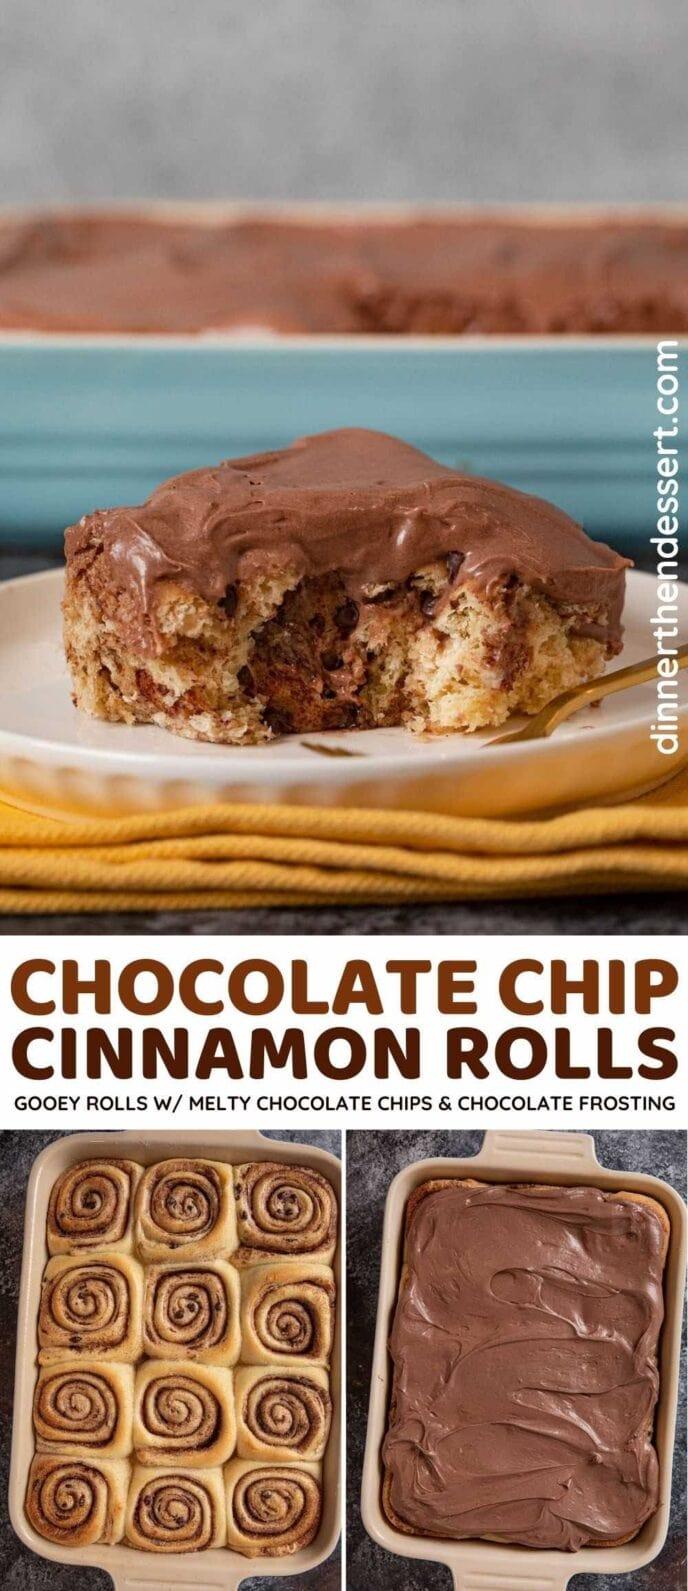 Chocolate Chip Cinnamon Rolls pinterest collage